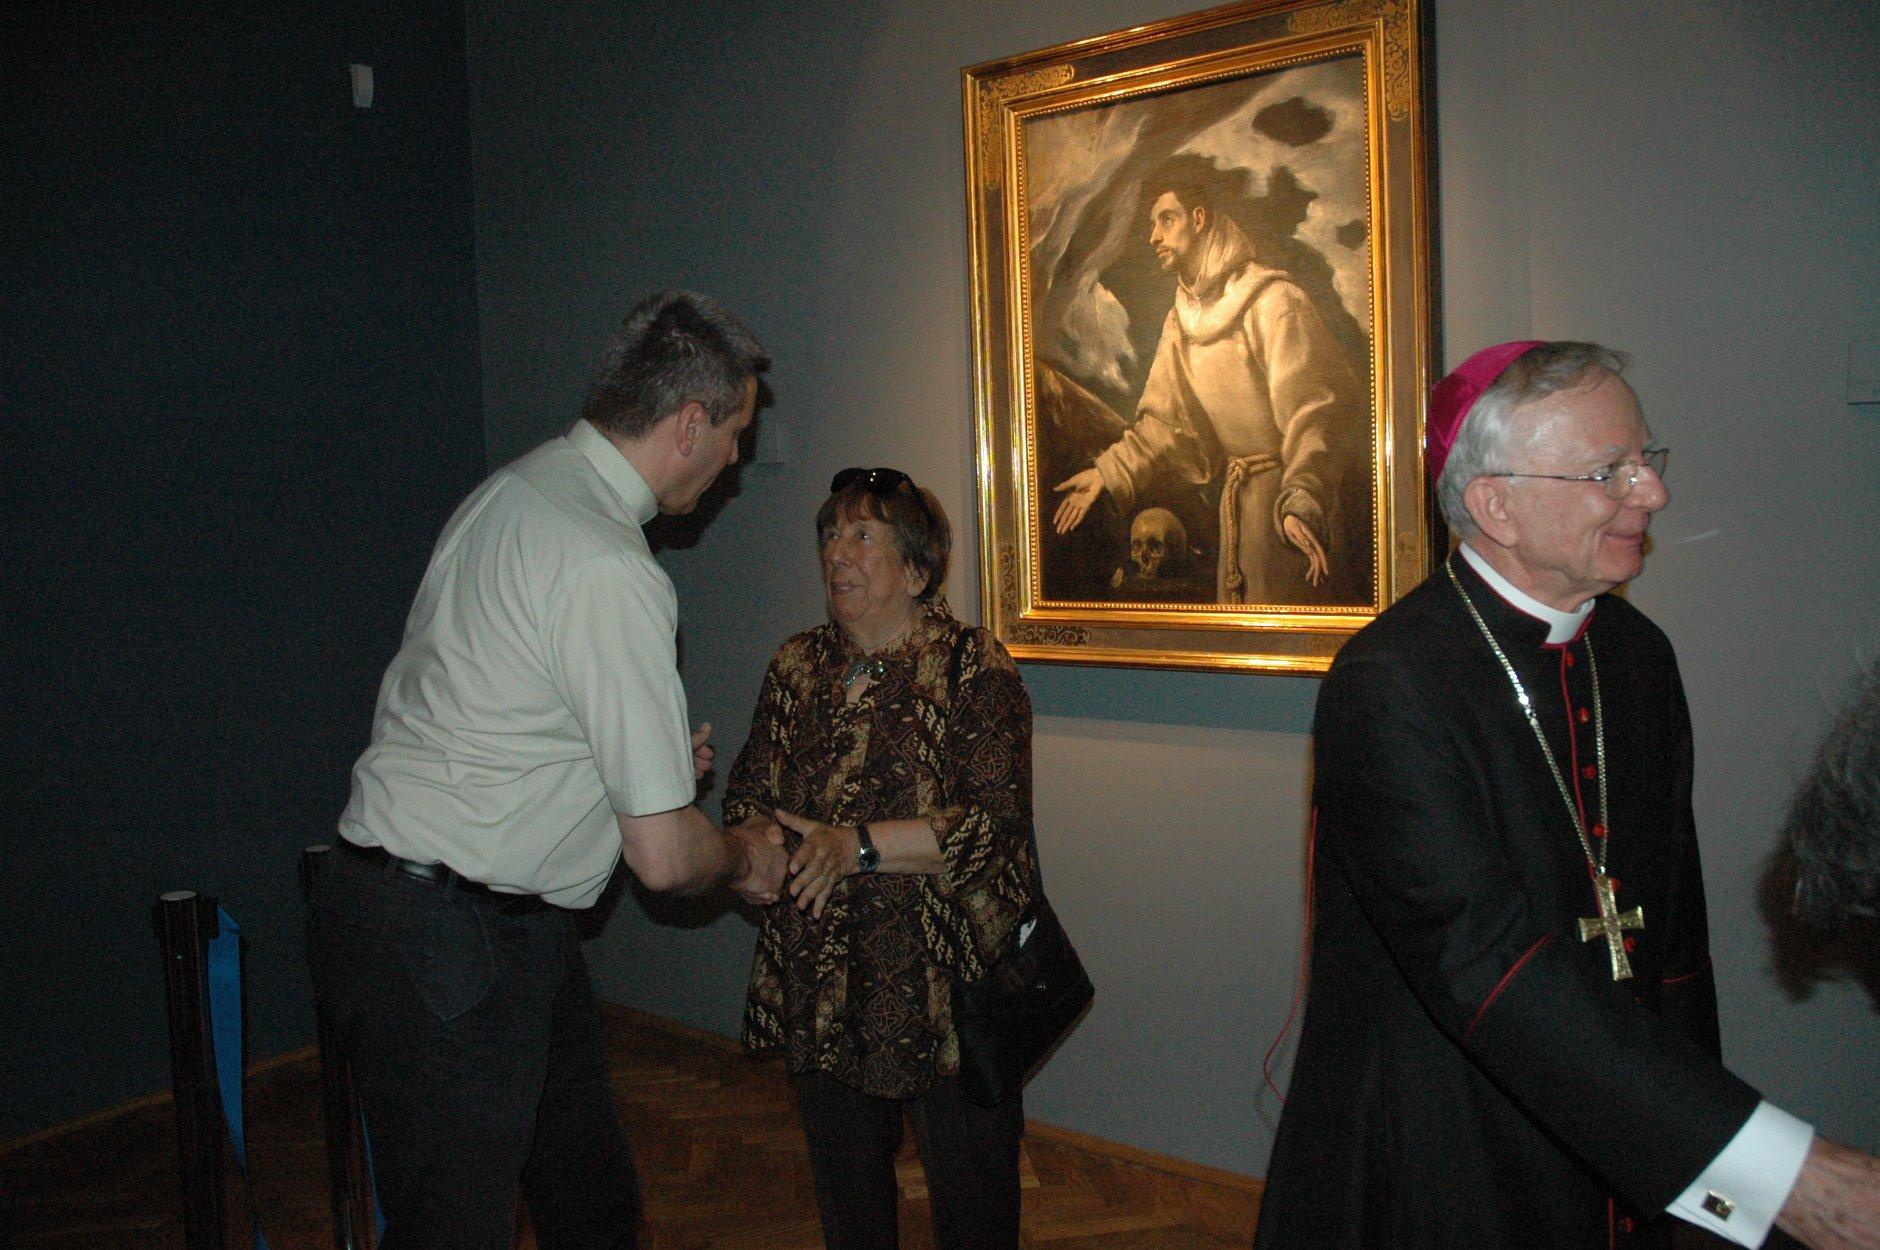 muzeum jedraszevski 2